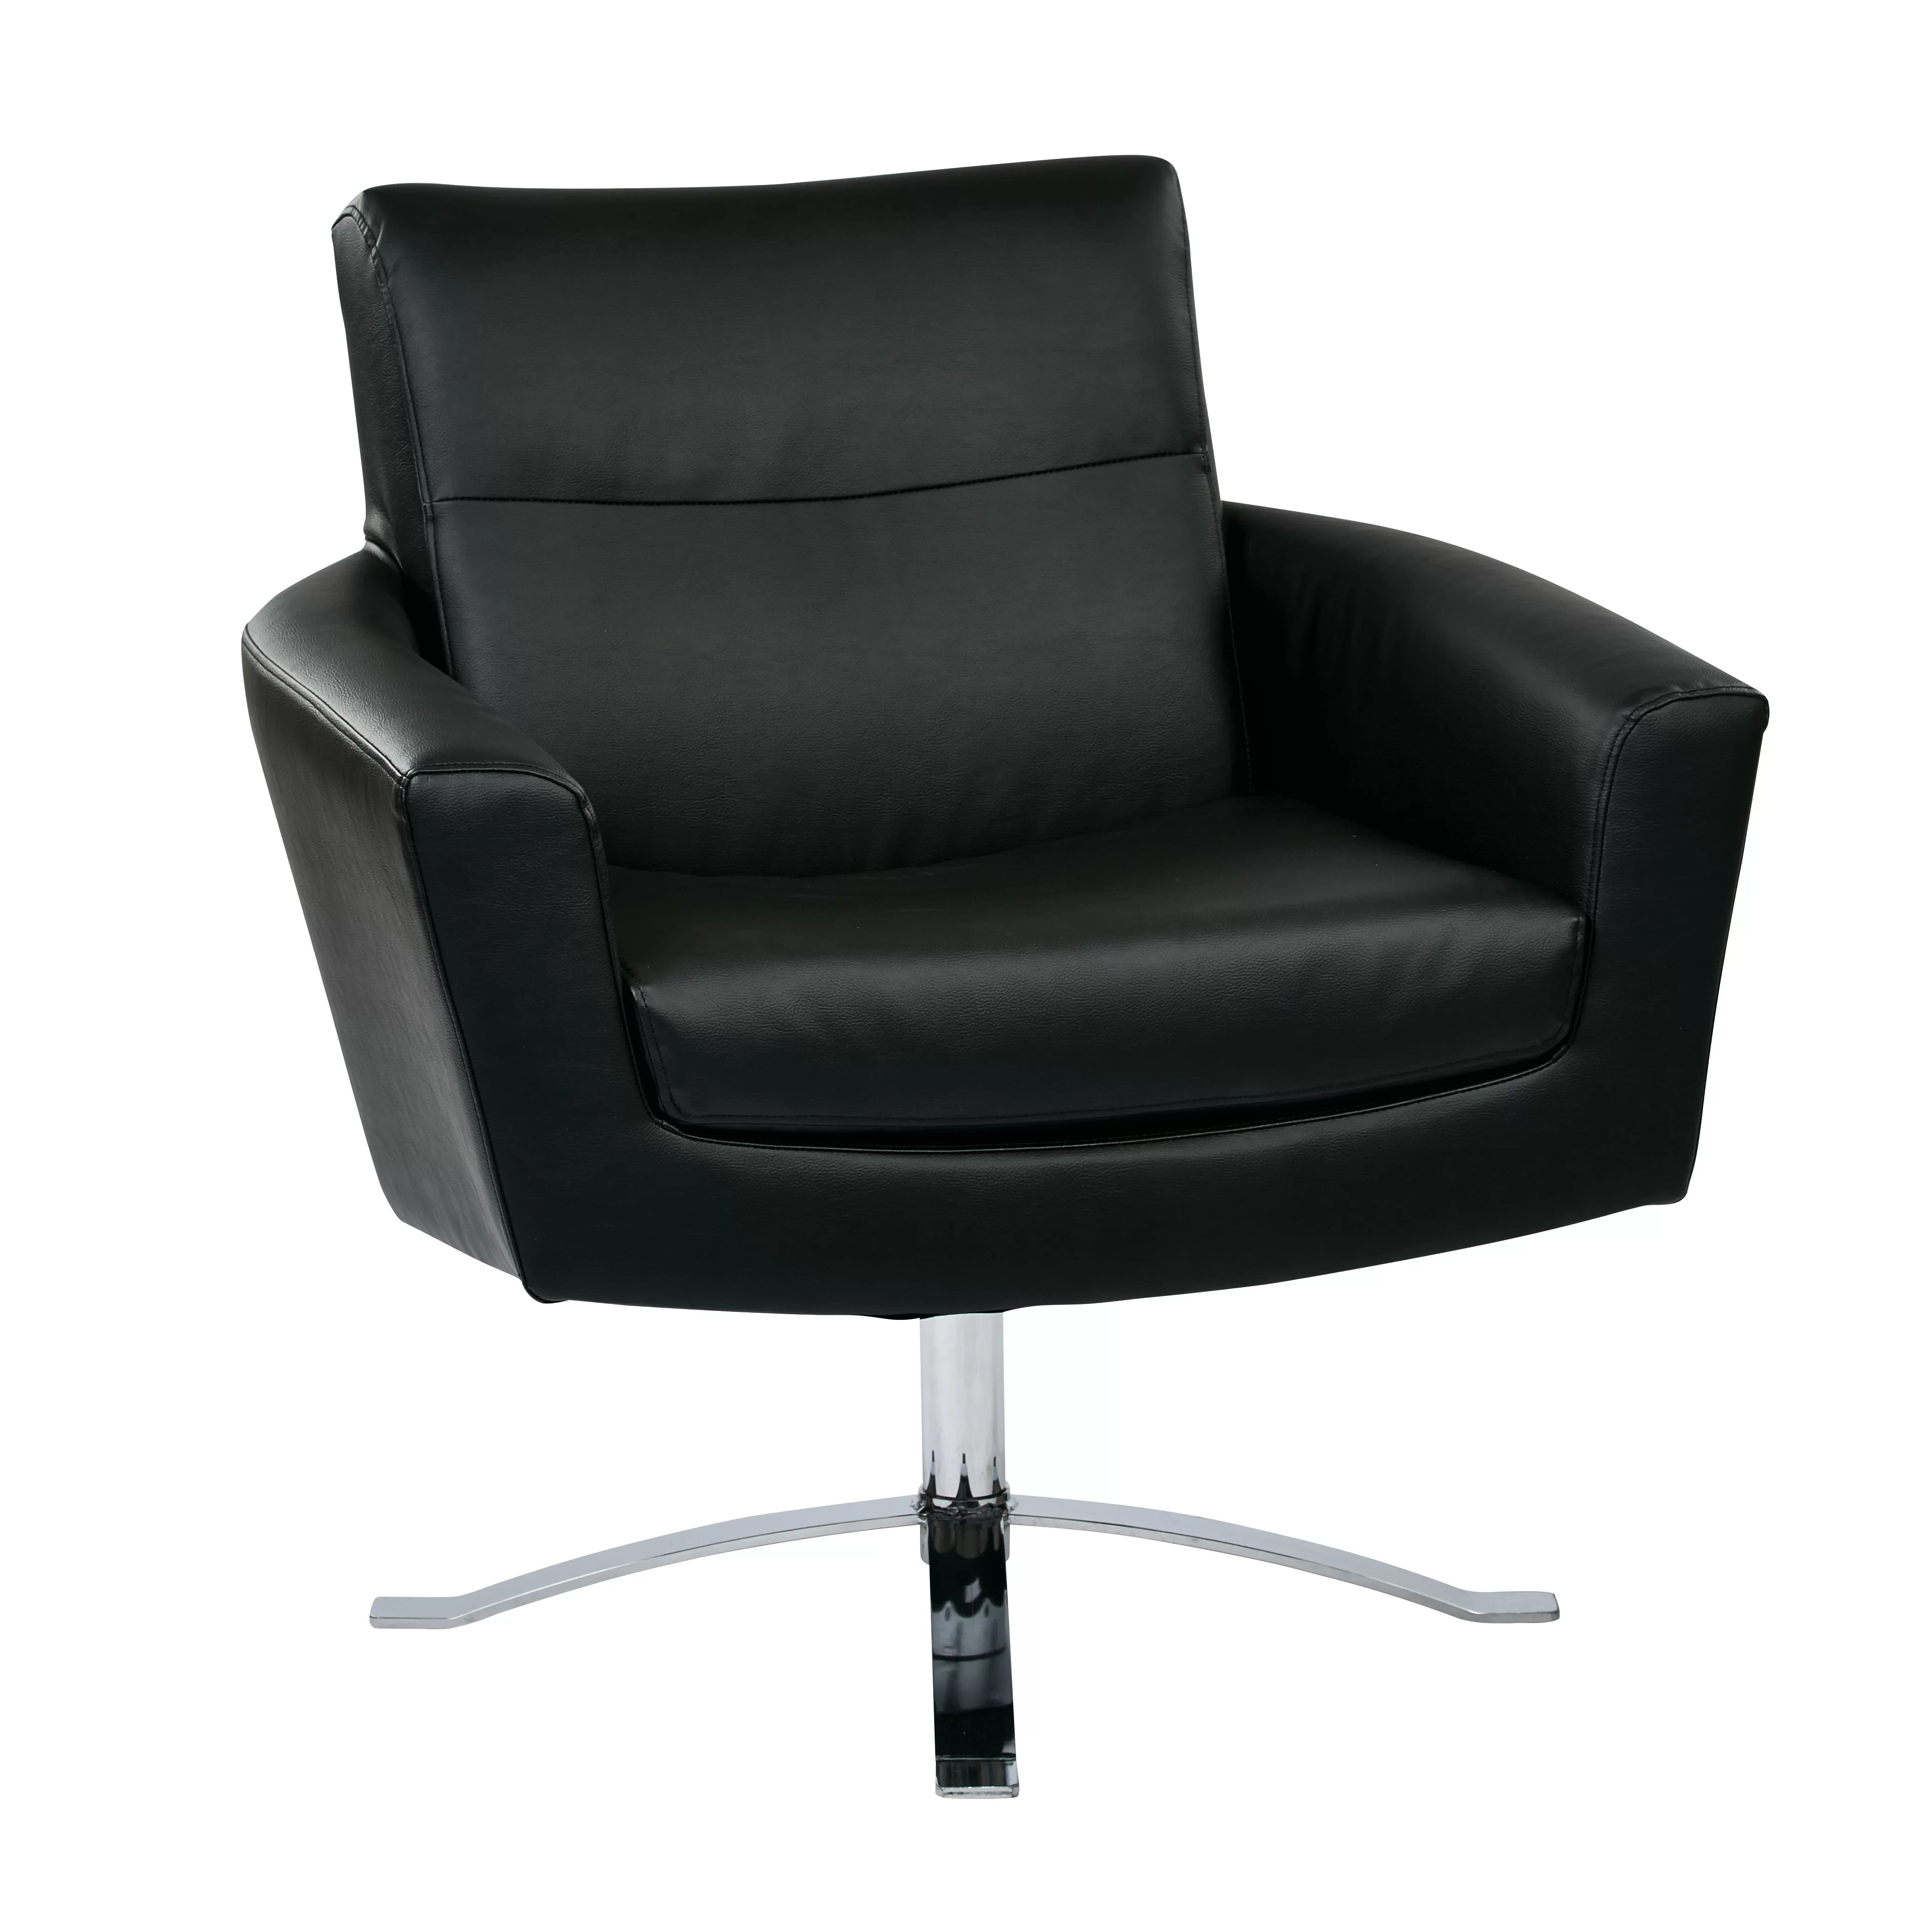 ave six chair ergonomic drawing nova arm and reviews wayfair